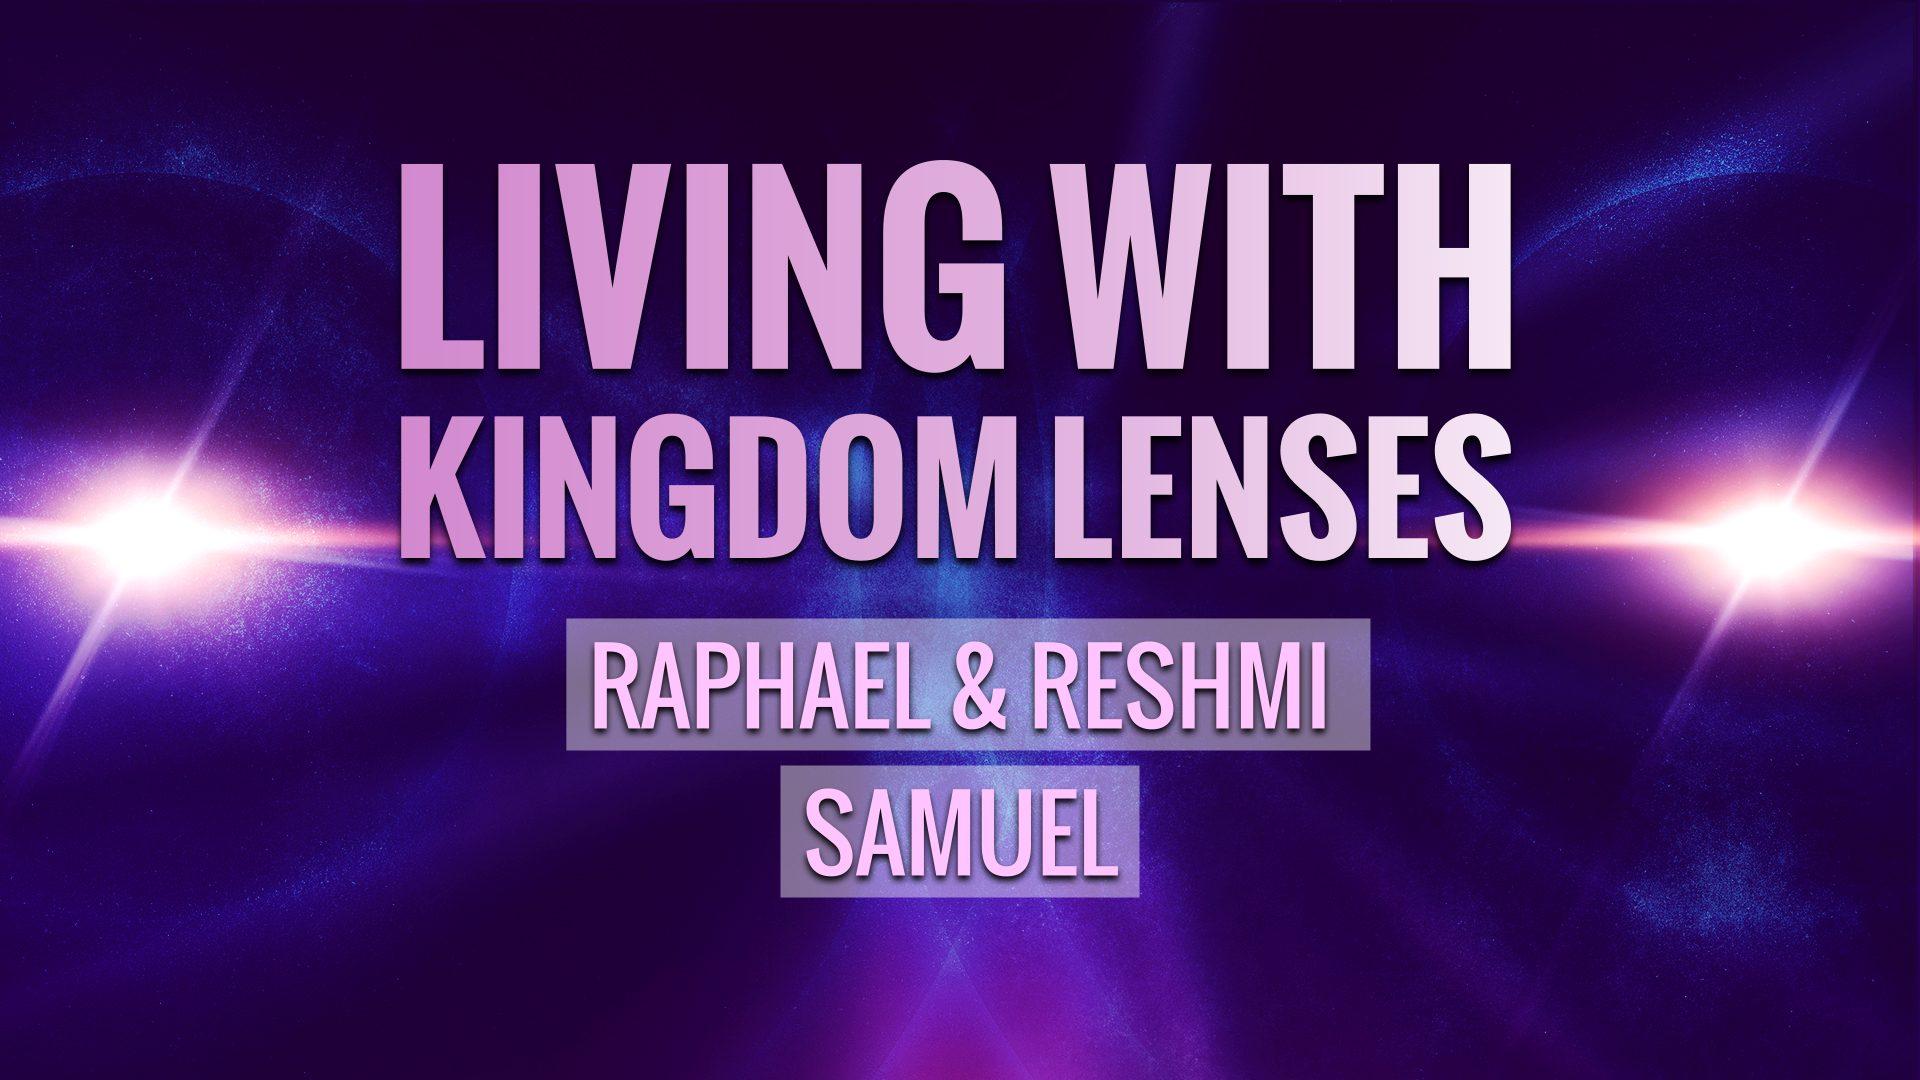 Kingdom Lenses